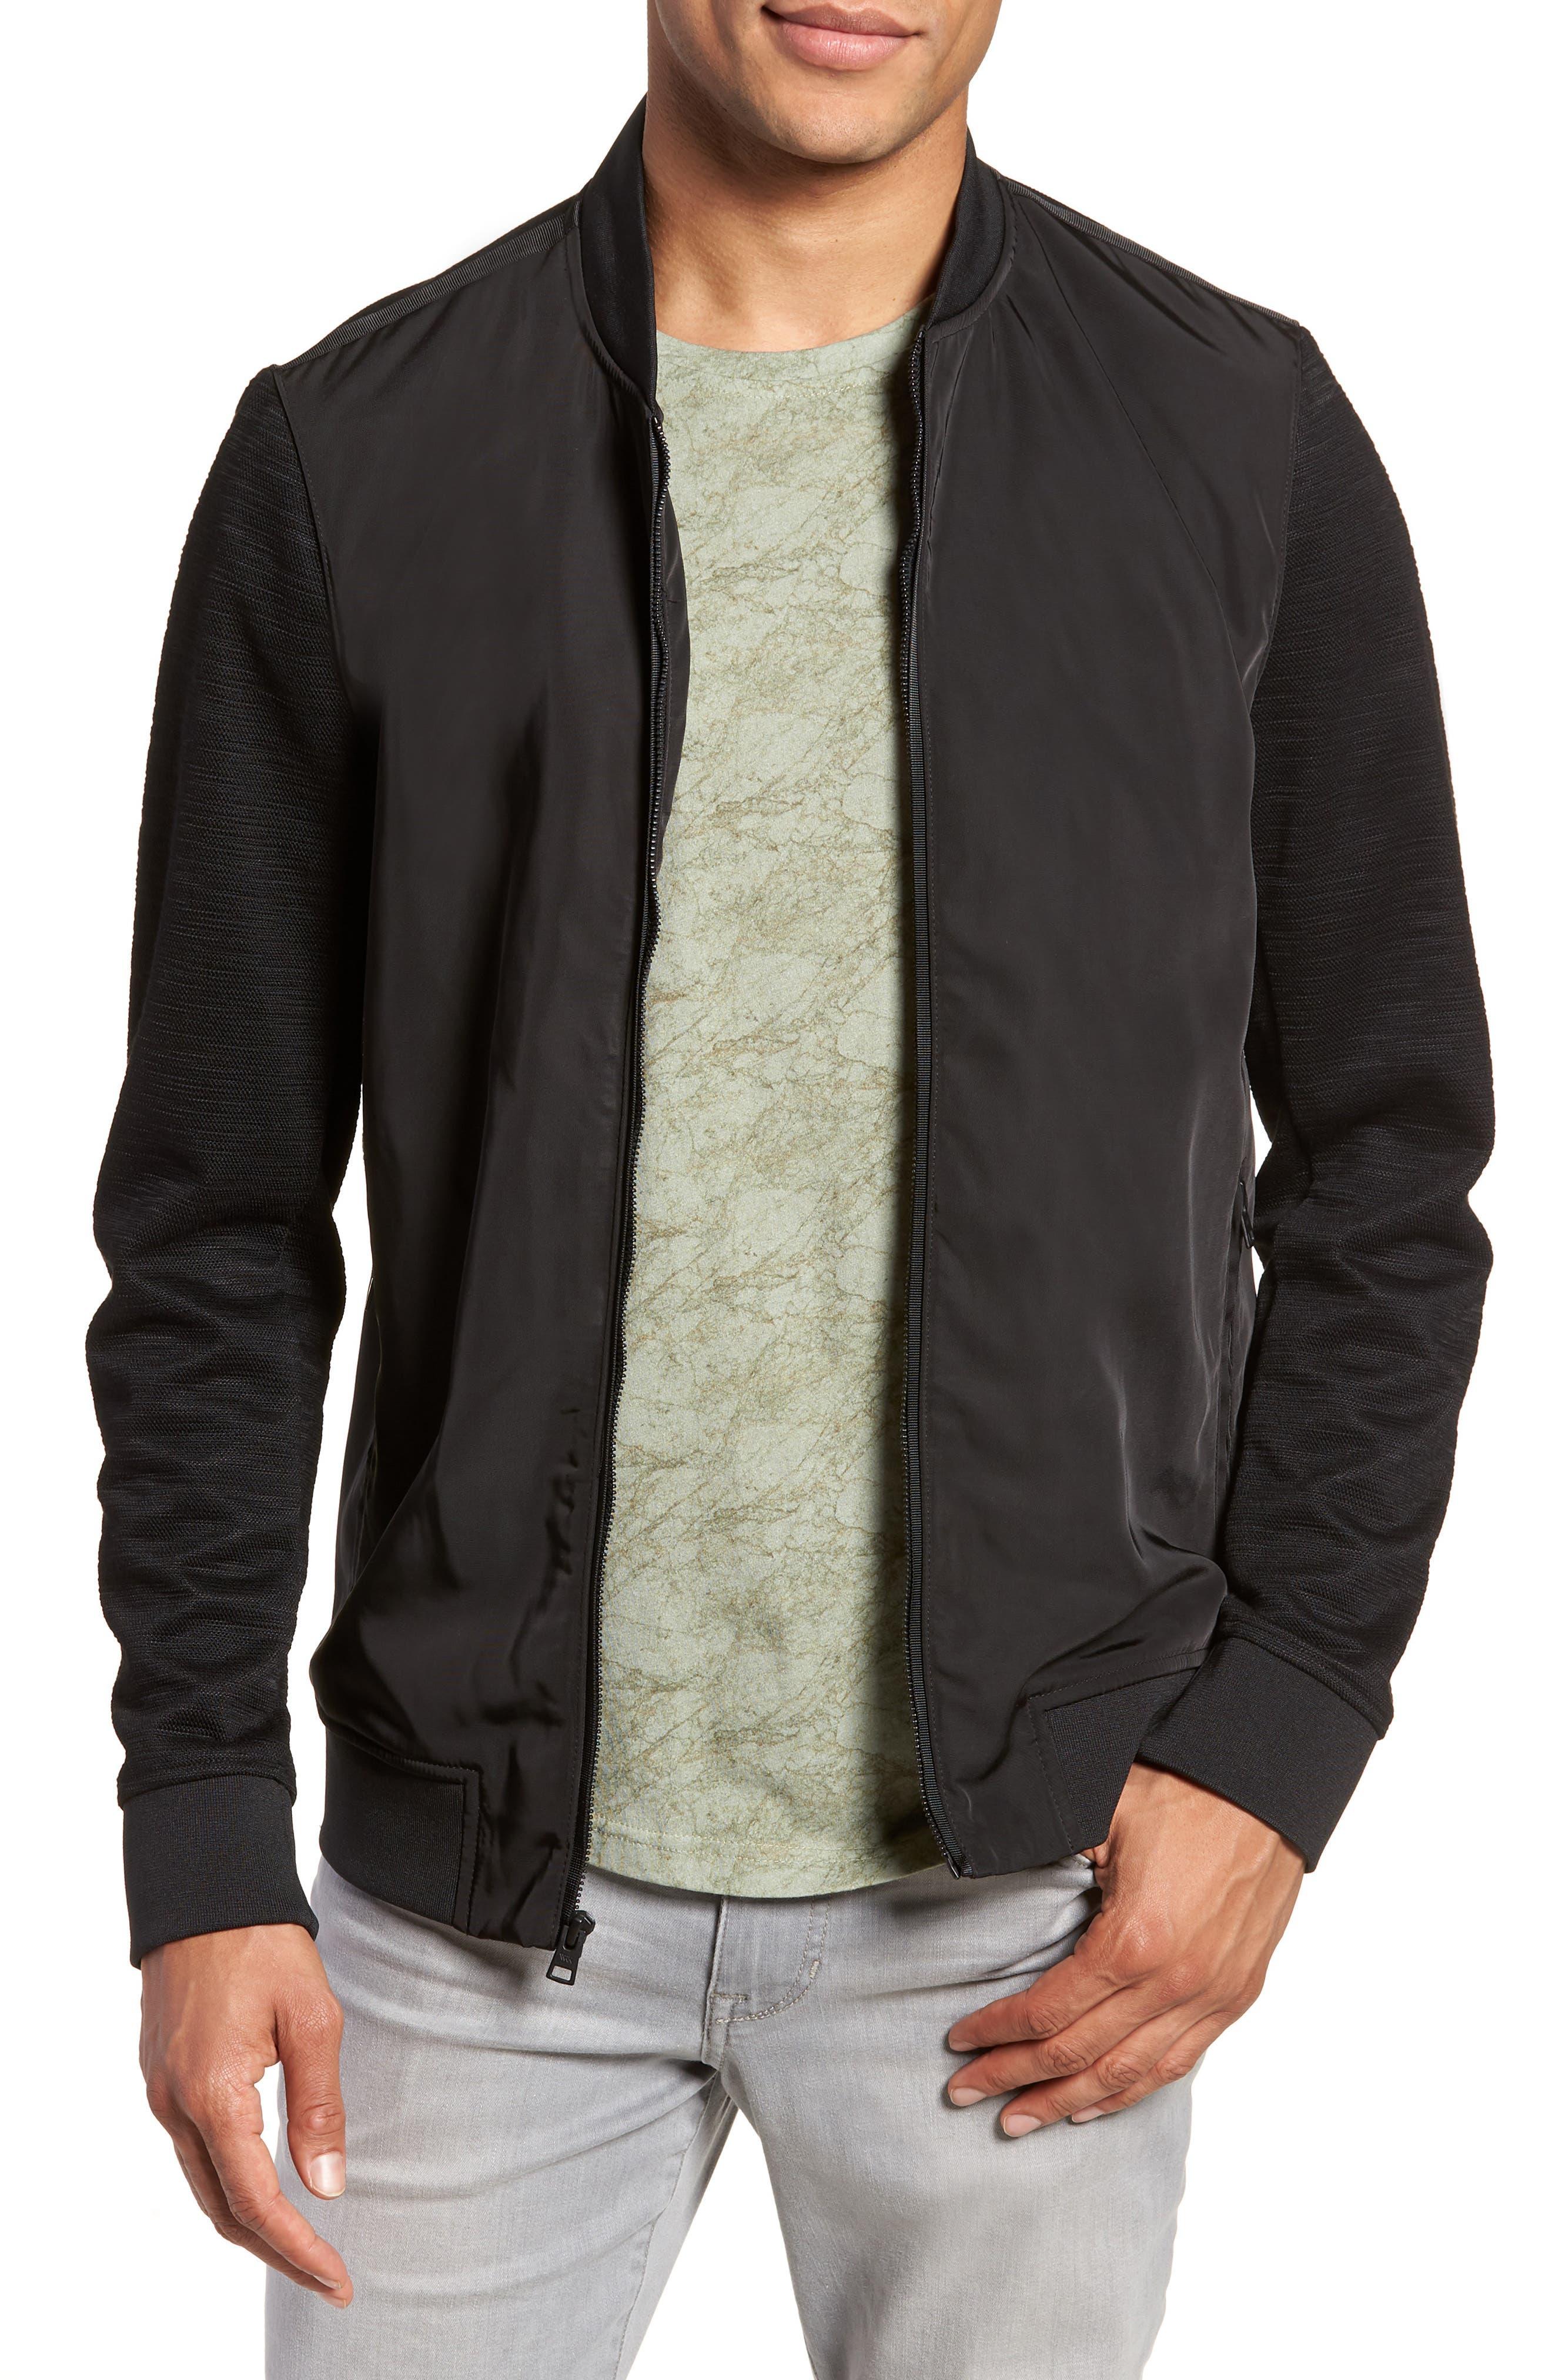 Gesso Slim Fit Bomber Jacket,                             Main thumbnail 1, color,                             Black